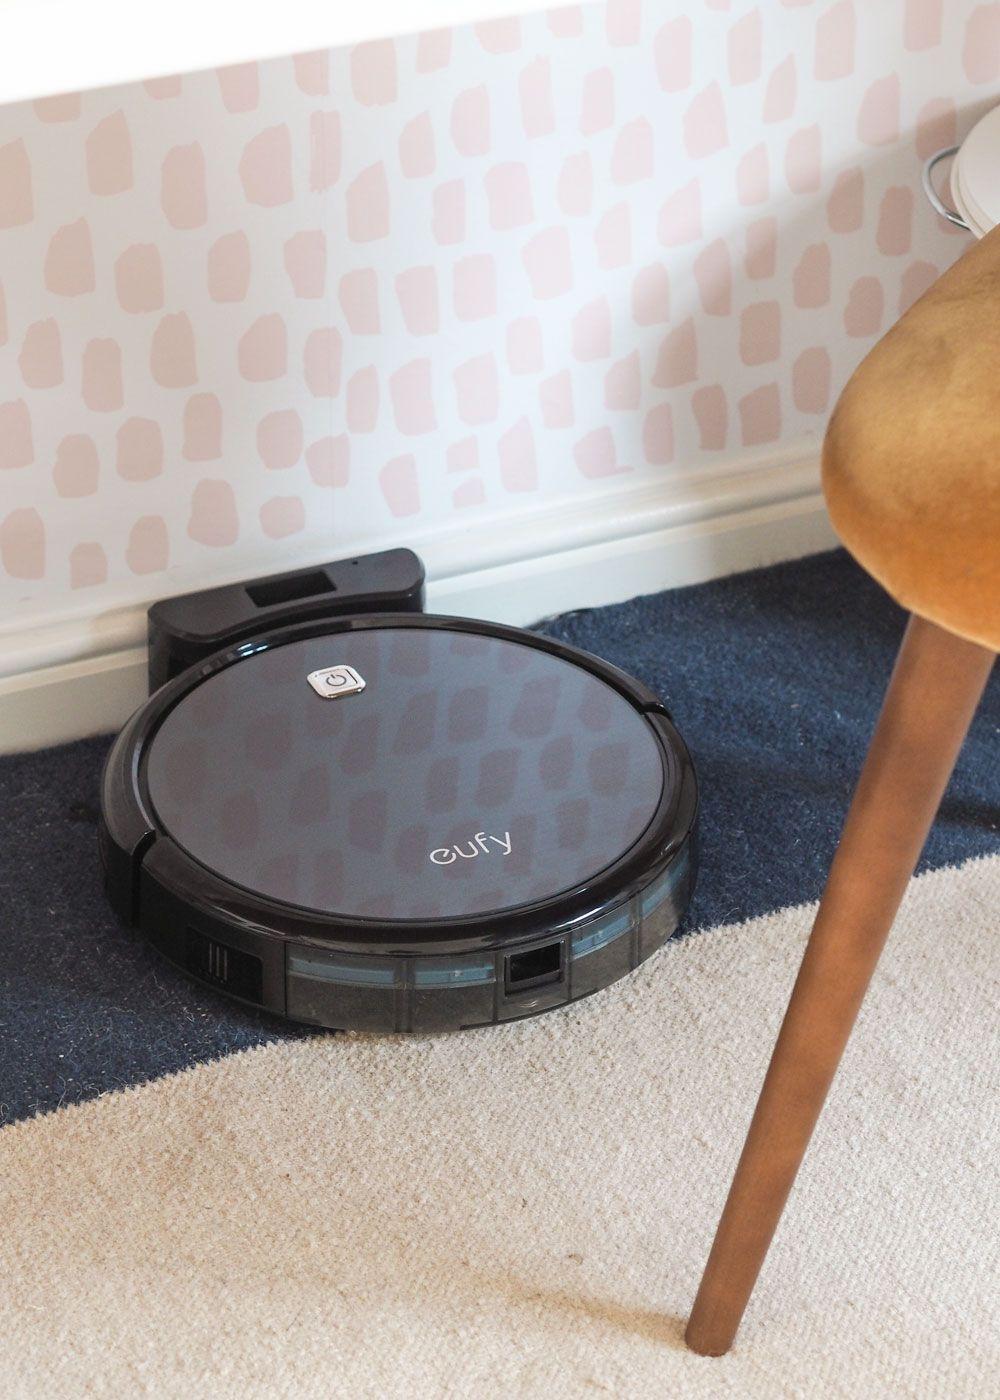 Eufy RoboVac 11 Vacuum Review | Home Cleaning Hacks | Vacuum reviews